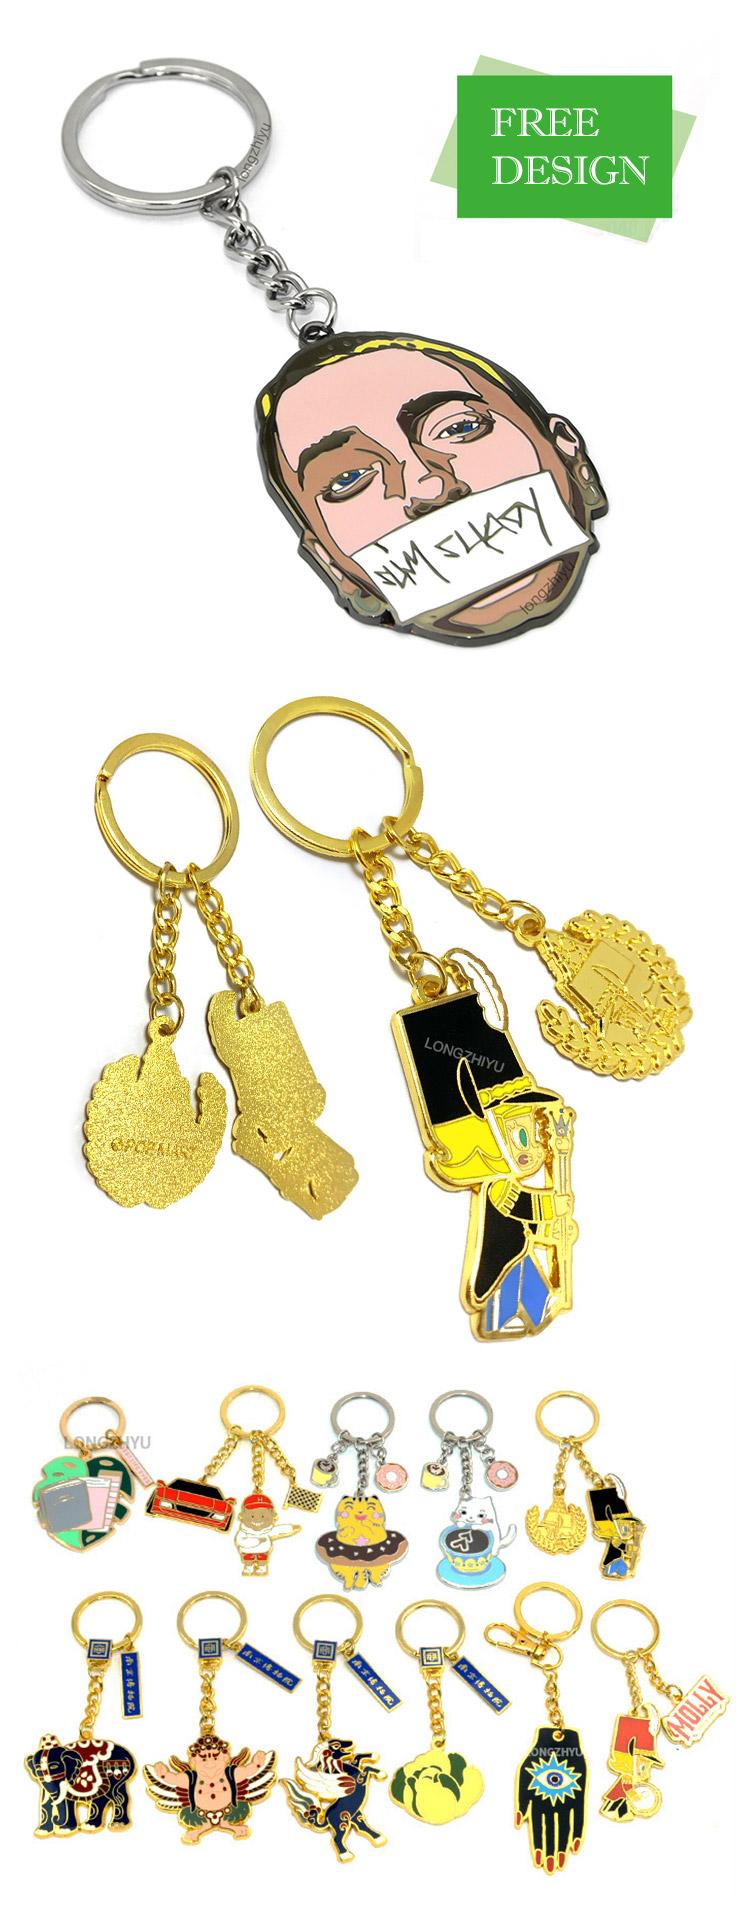 Longzhiyu 14 Years Manufacturer Stethoscope Keychain Spiral Keychain Set Keyring Self Defense Key Chain Rome Keychain Buy Stethoscope Keychain Spiral Keychain Self Defense Key Chain Product On Alibaba Com